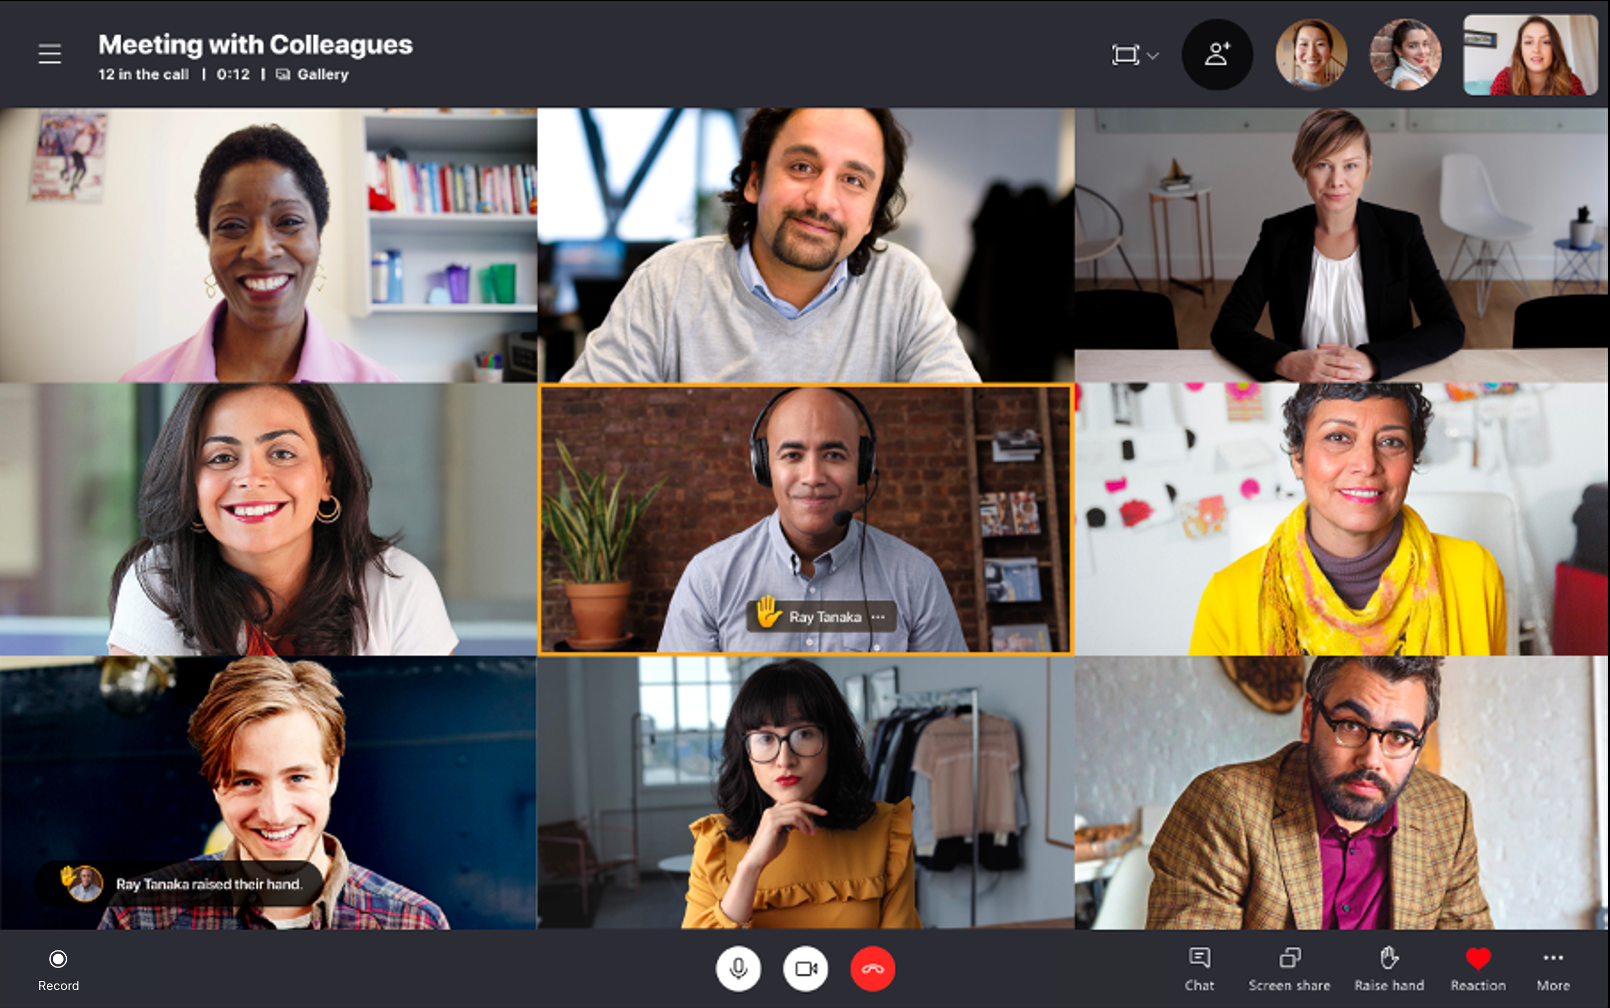 "「Skype」がミーティング中の""挙手""に対応"